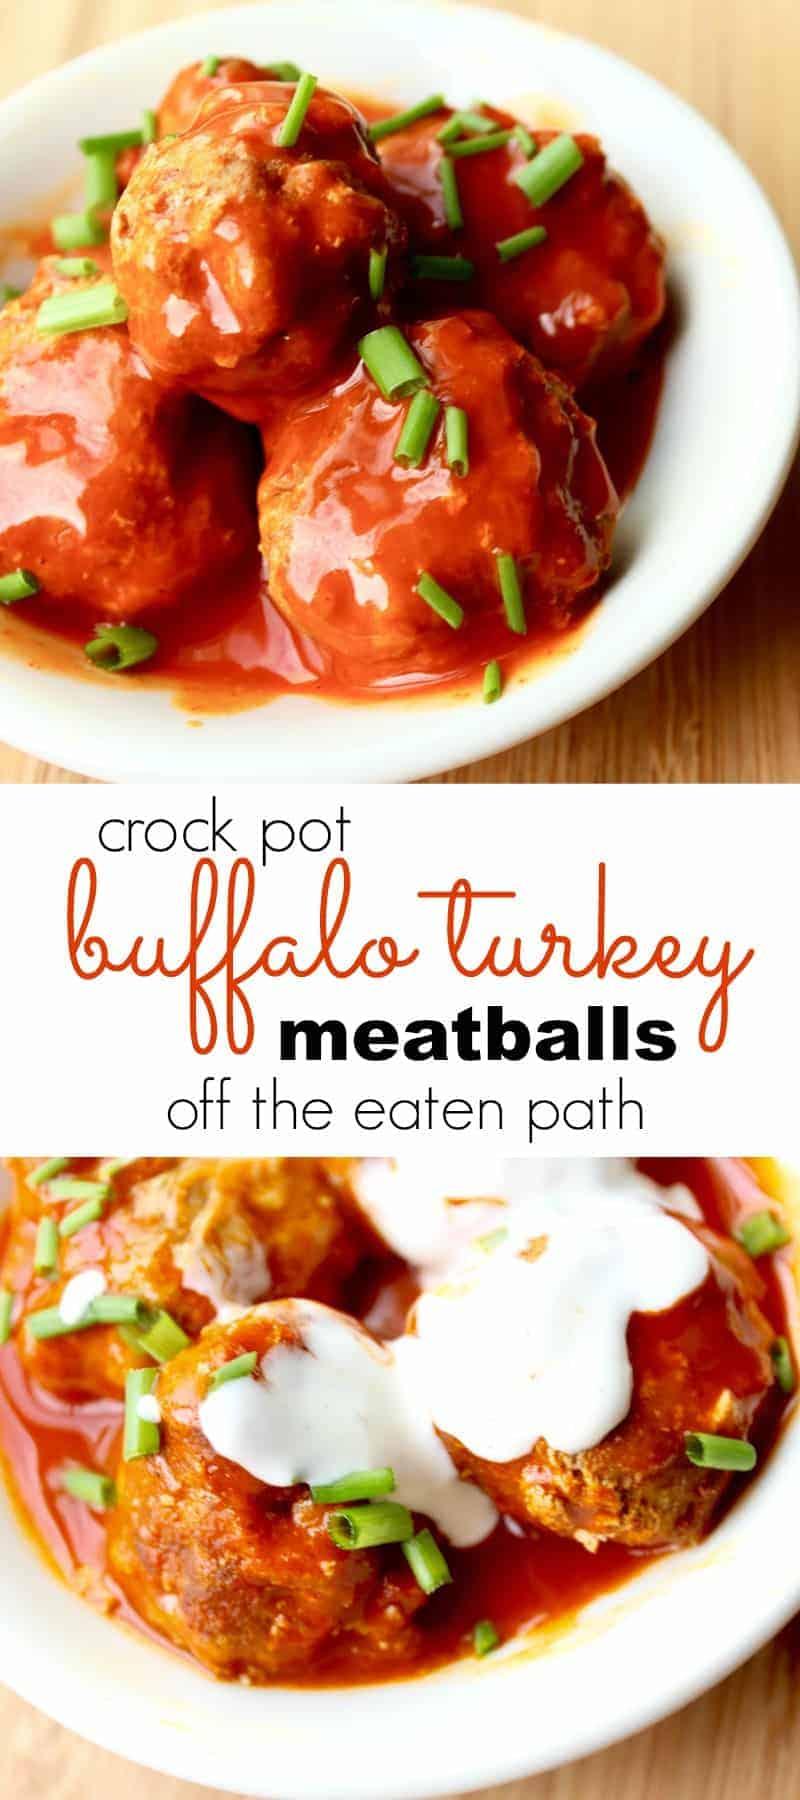 crock pot buffalo turkey meatballs